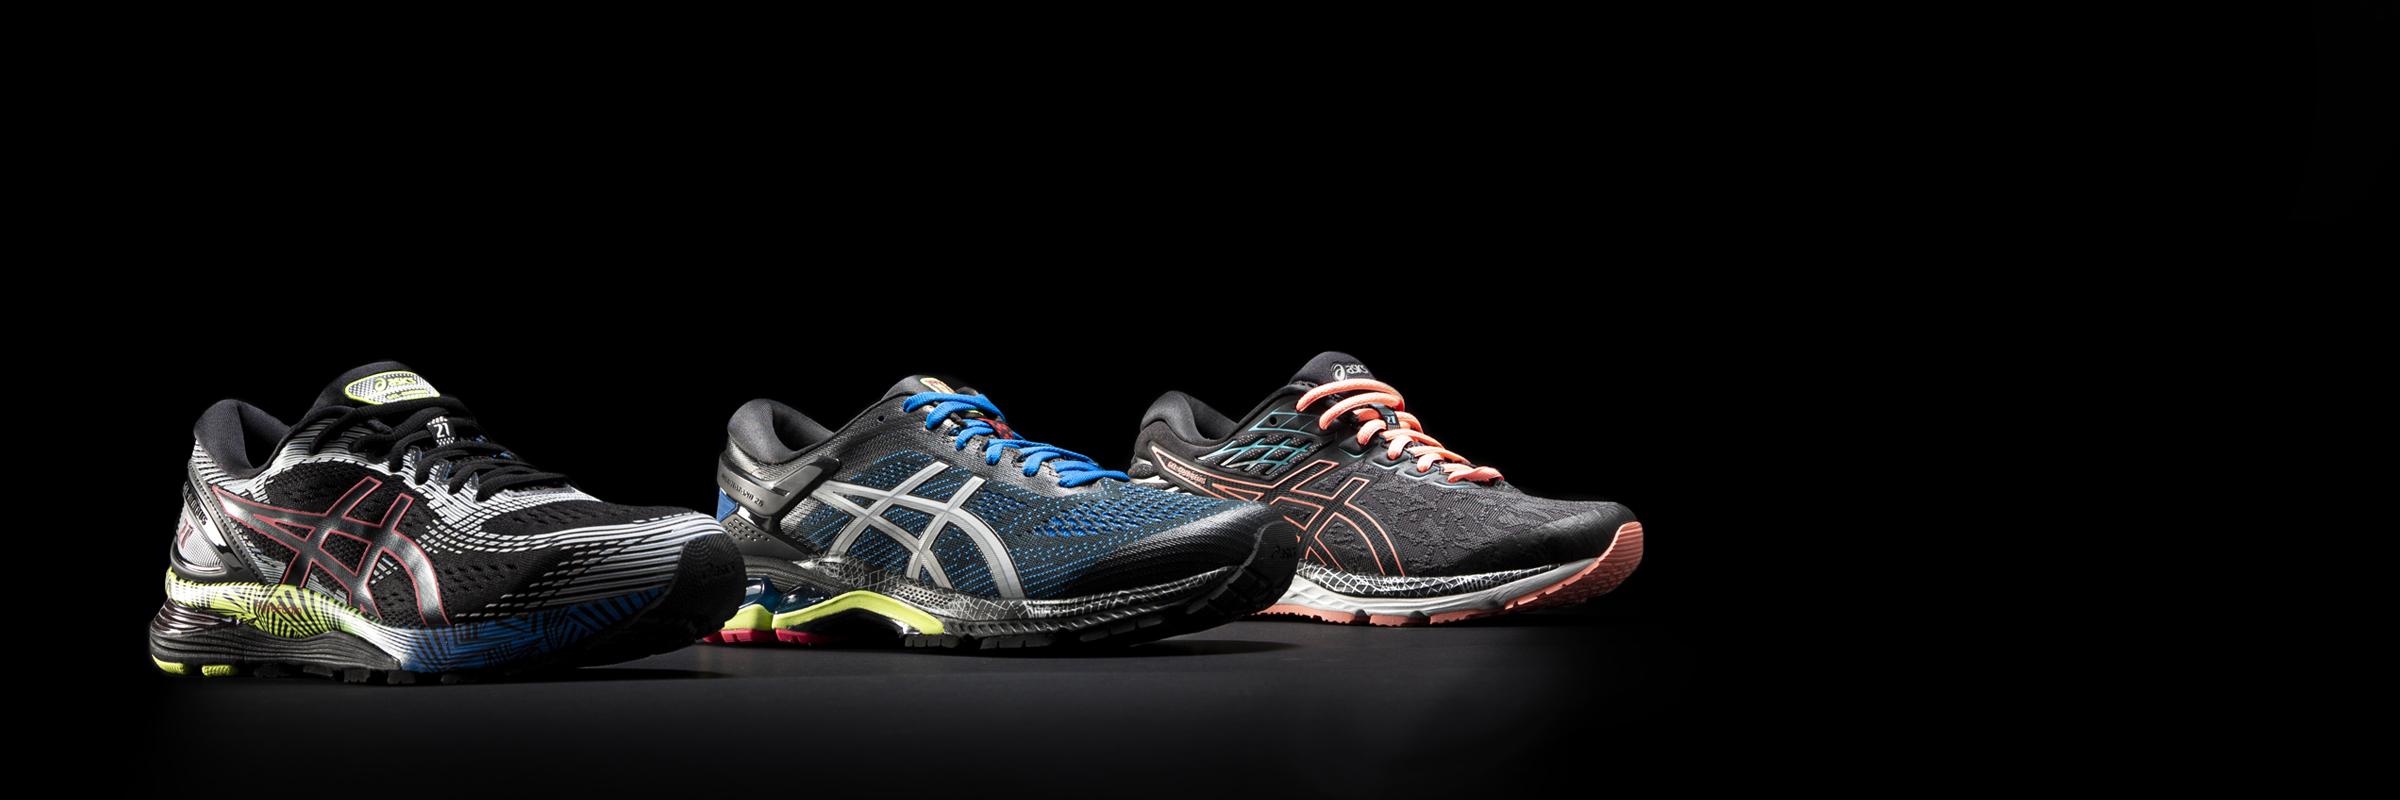 new products aaeb9 f1c65 Negozio Running Online | Mister Running Shop